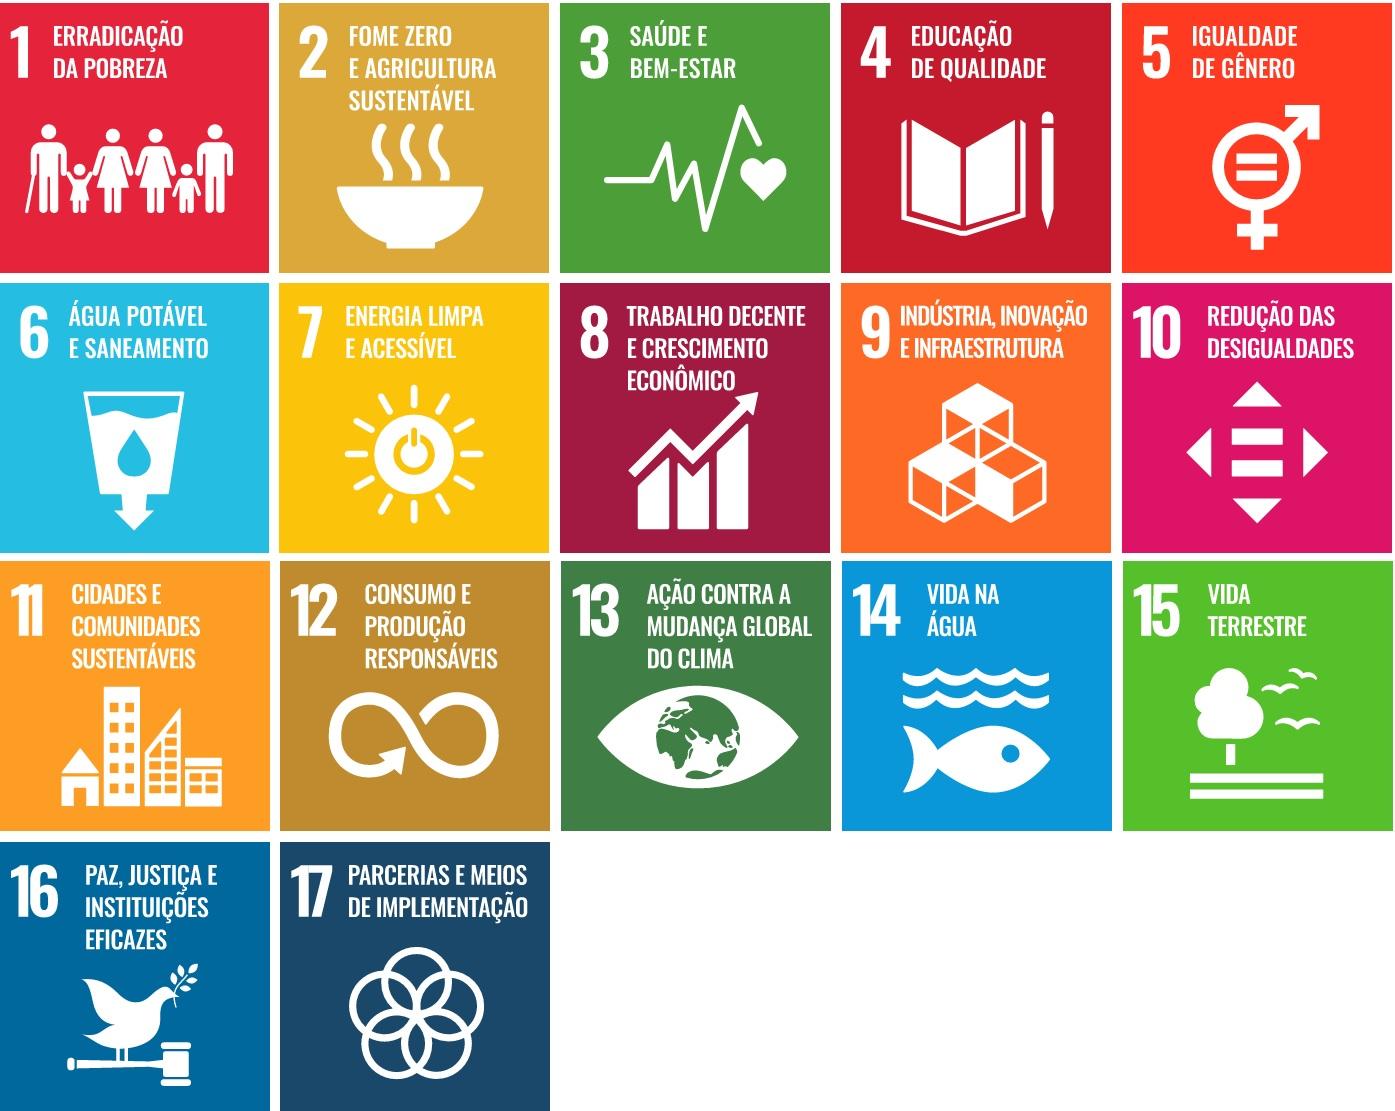 3. Imagem Agenda 2030